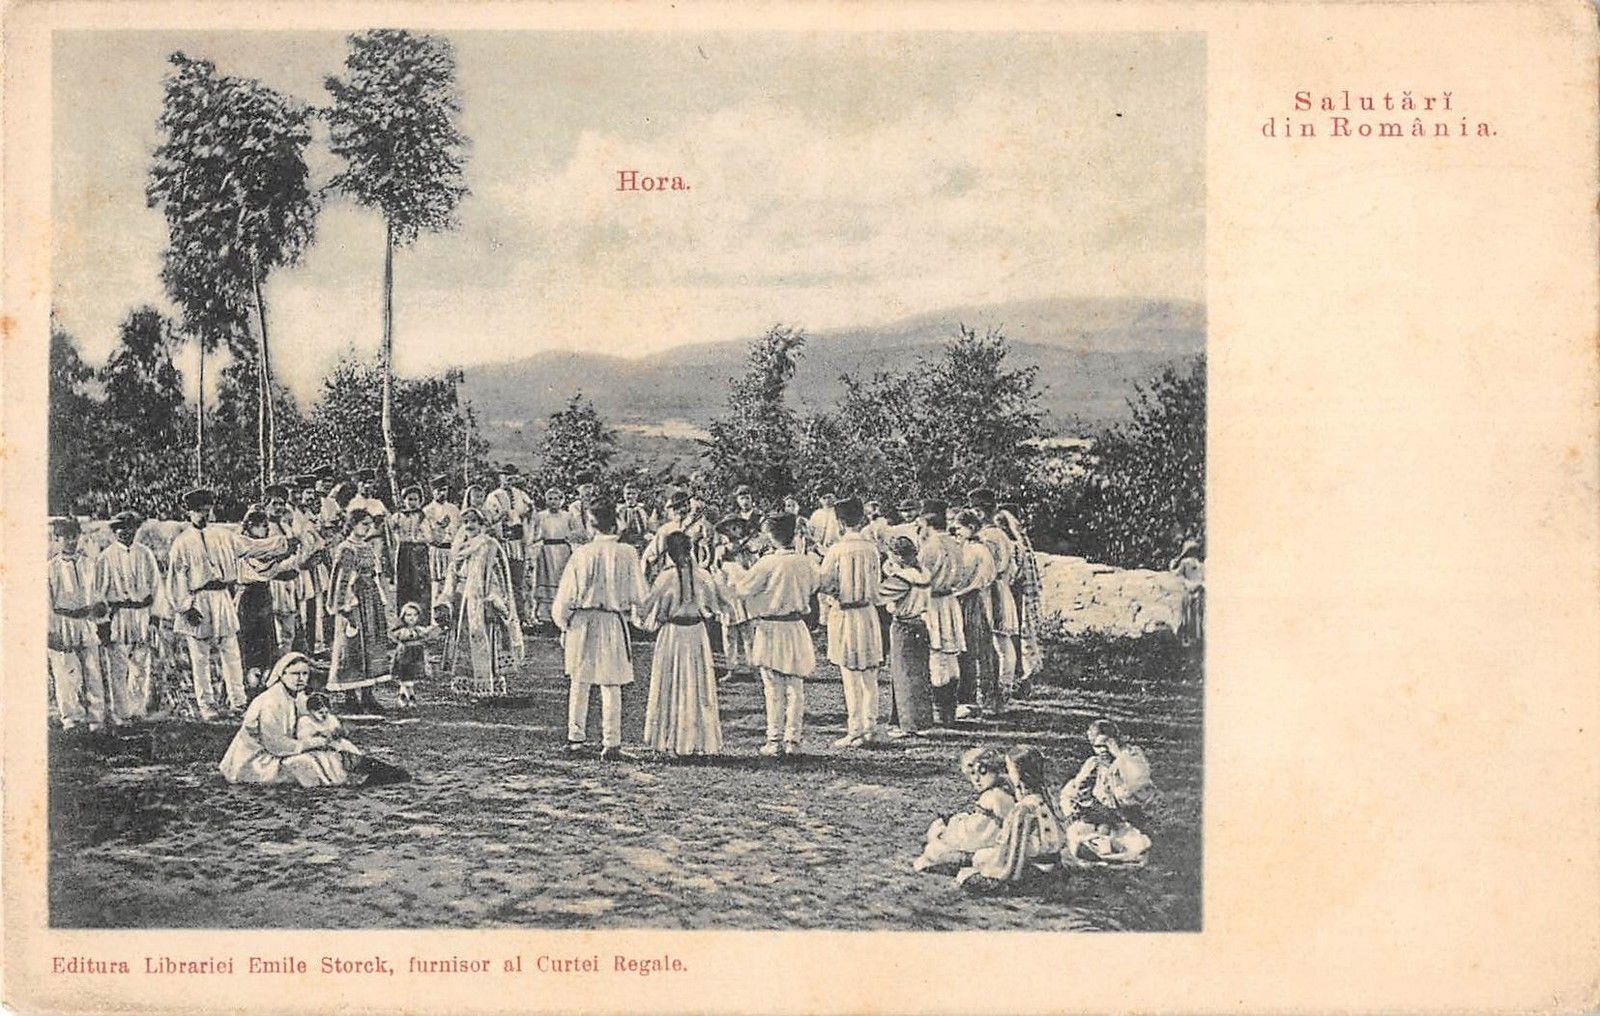 B78511 hora dance music types folklore costumes romania / HipPostcard